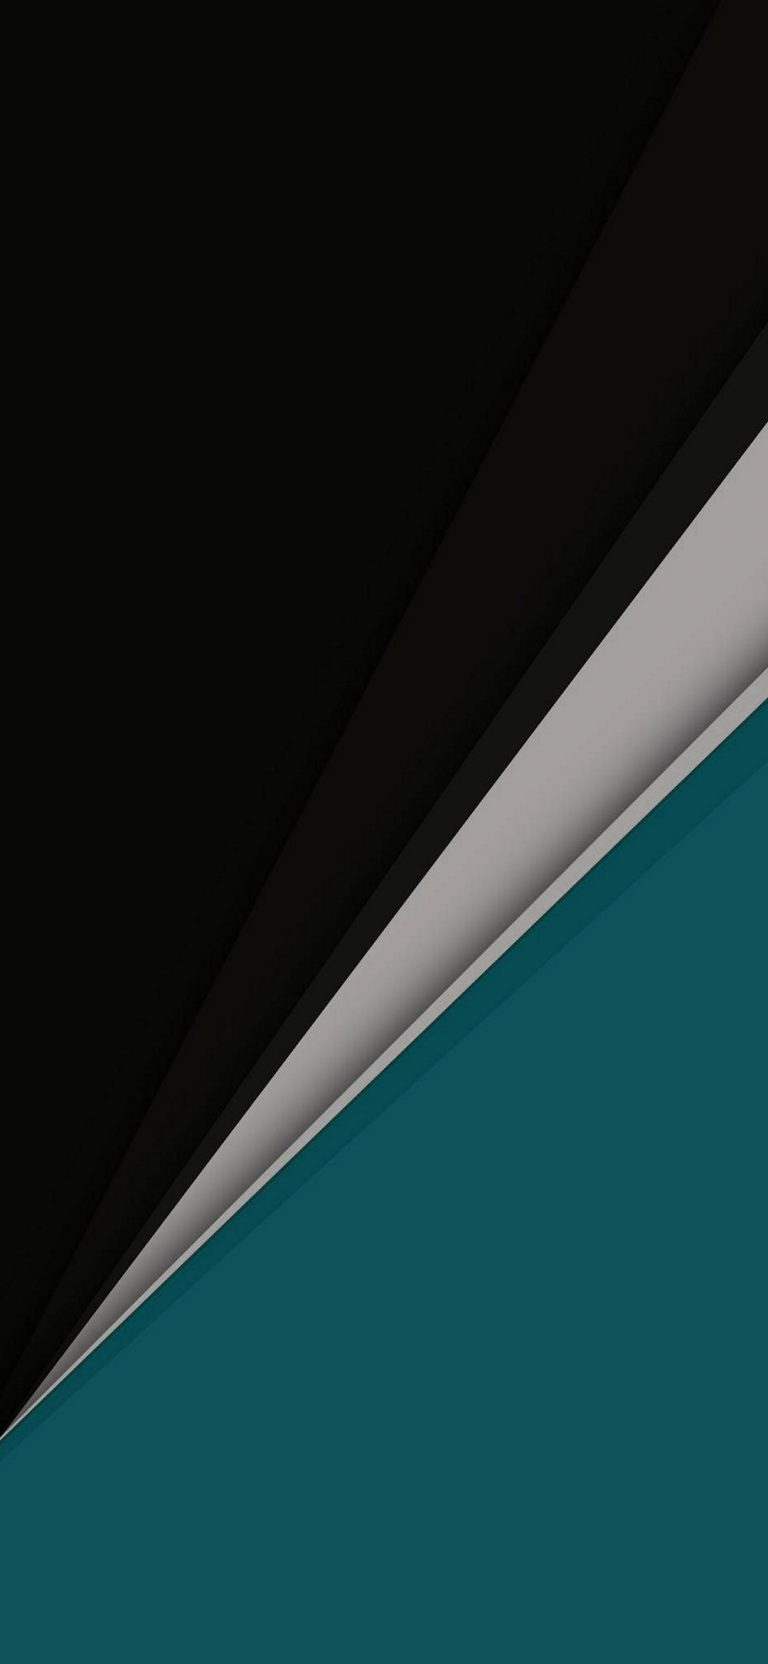 Black Phone Wallpaper 1080x2340 006 768x1664